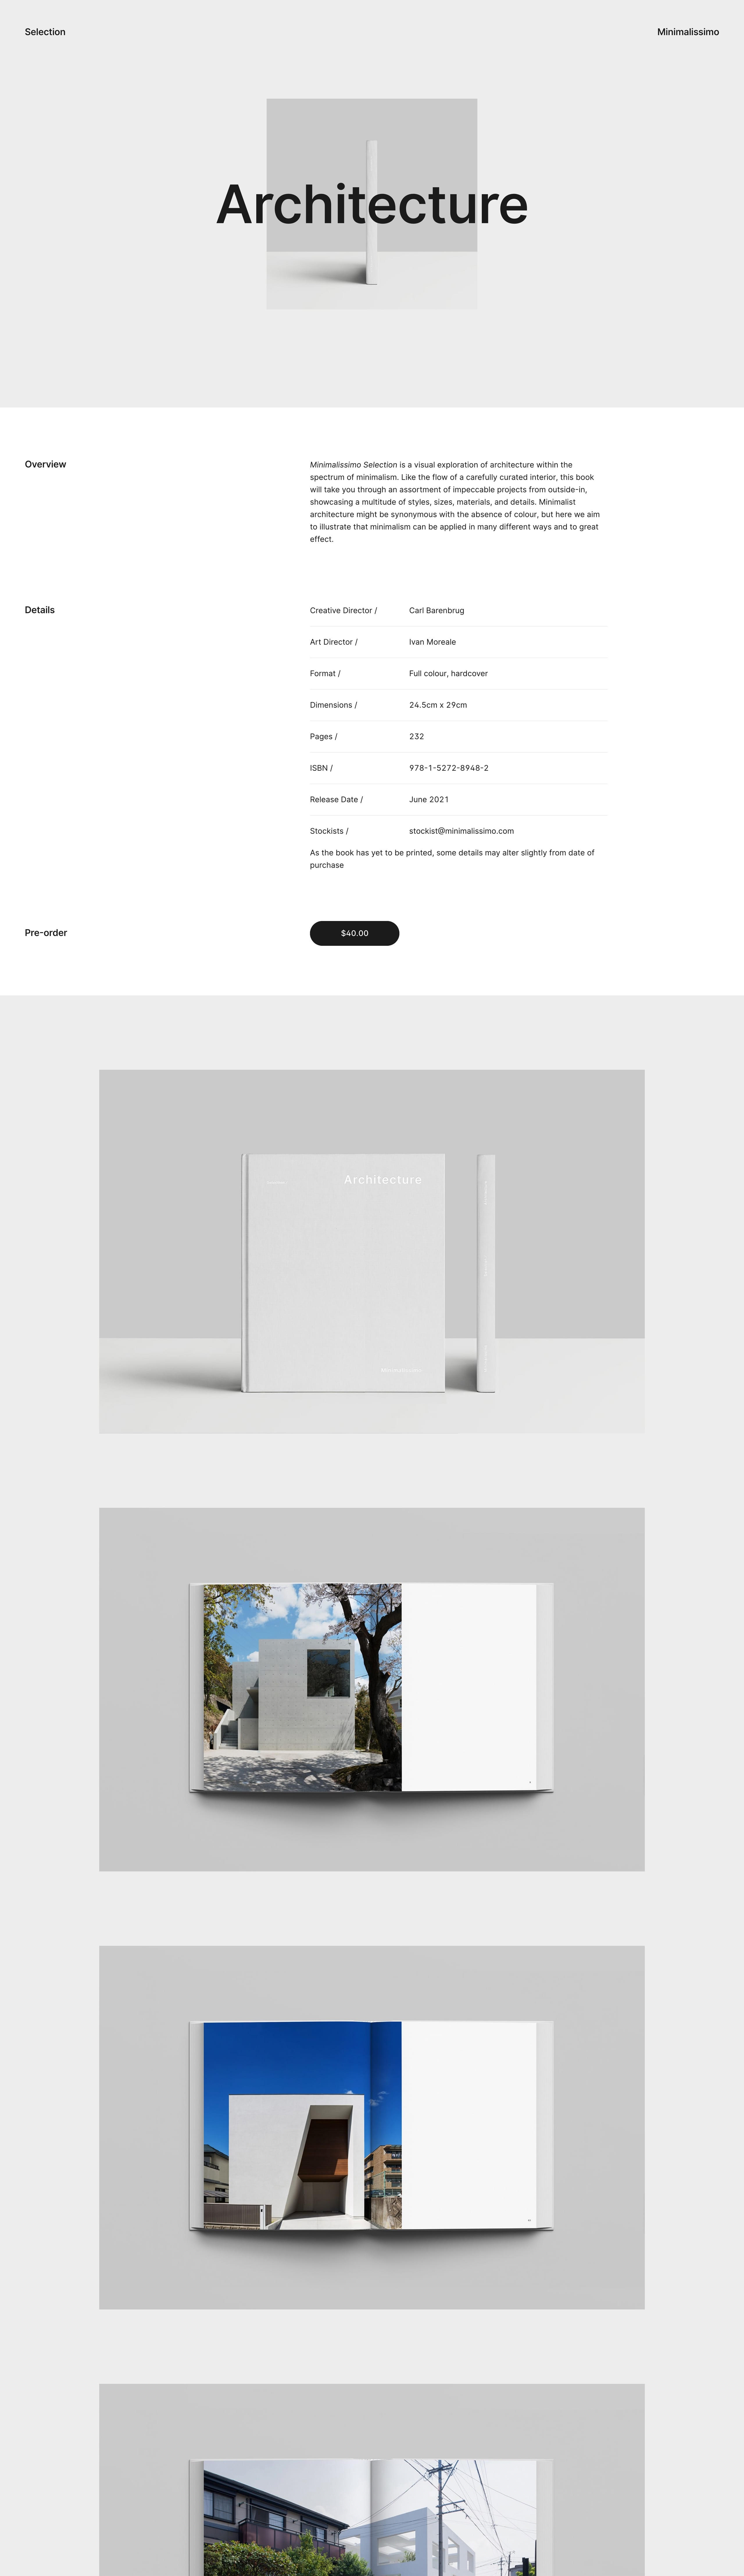 Minimalissimo – Selection Website Screenshot